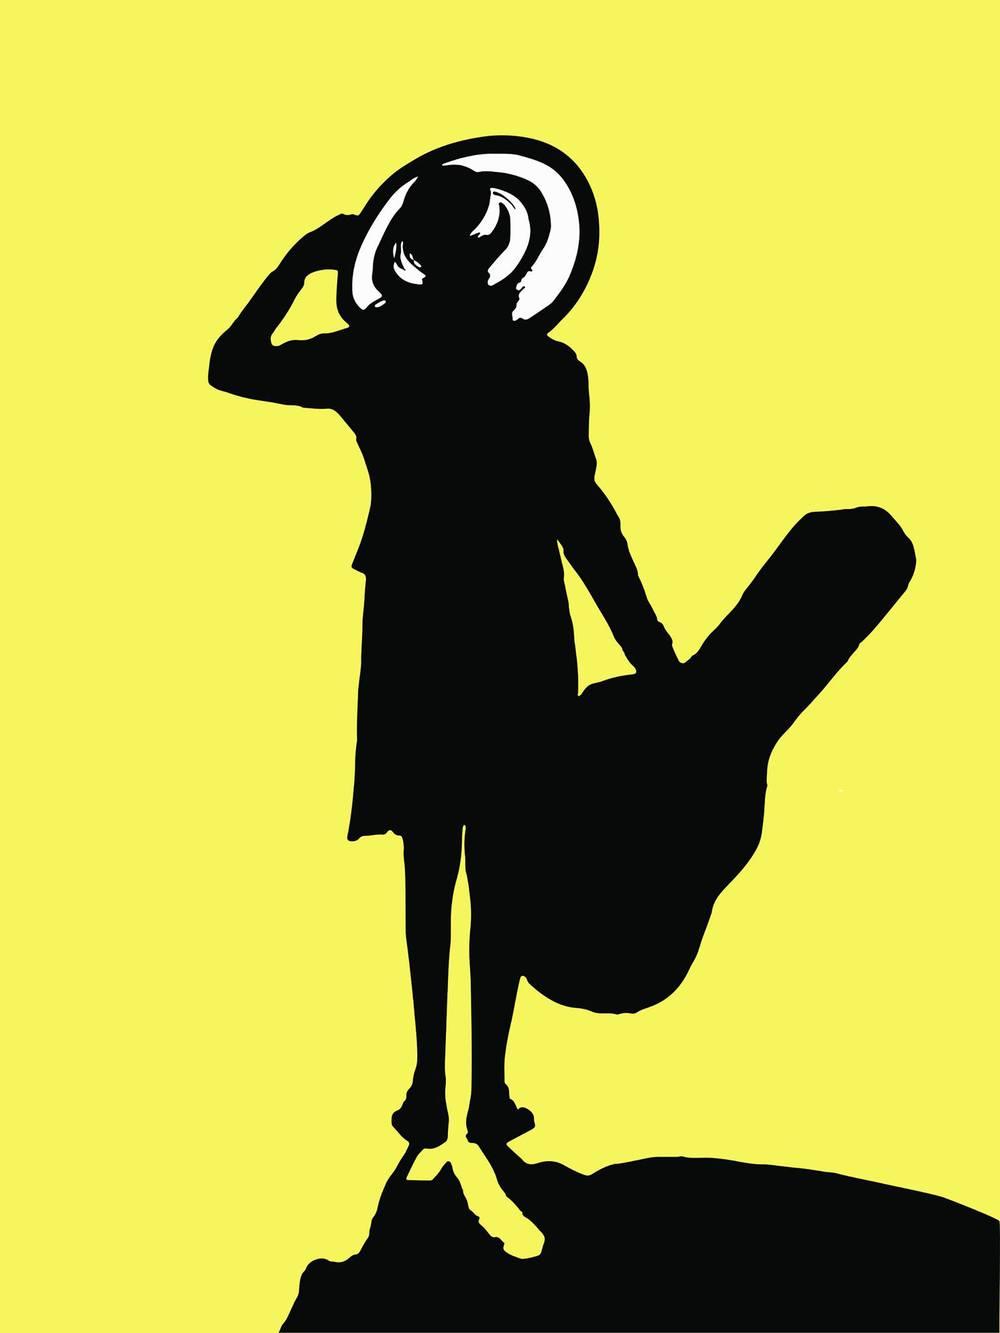 Alternative_Sound_of_Music_Poster.jpg